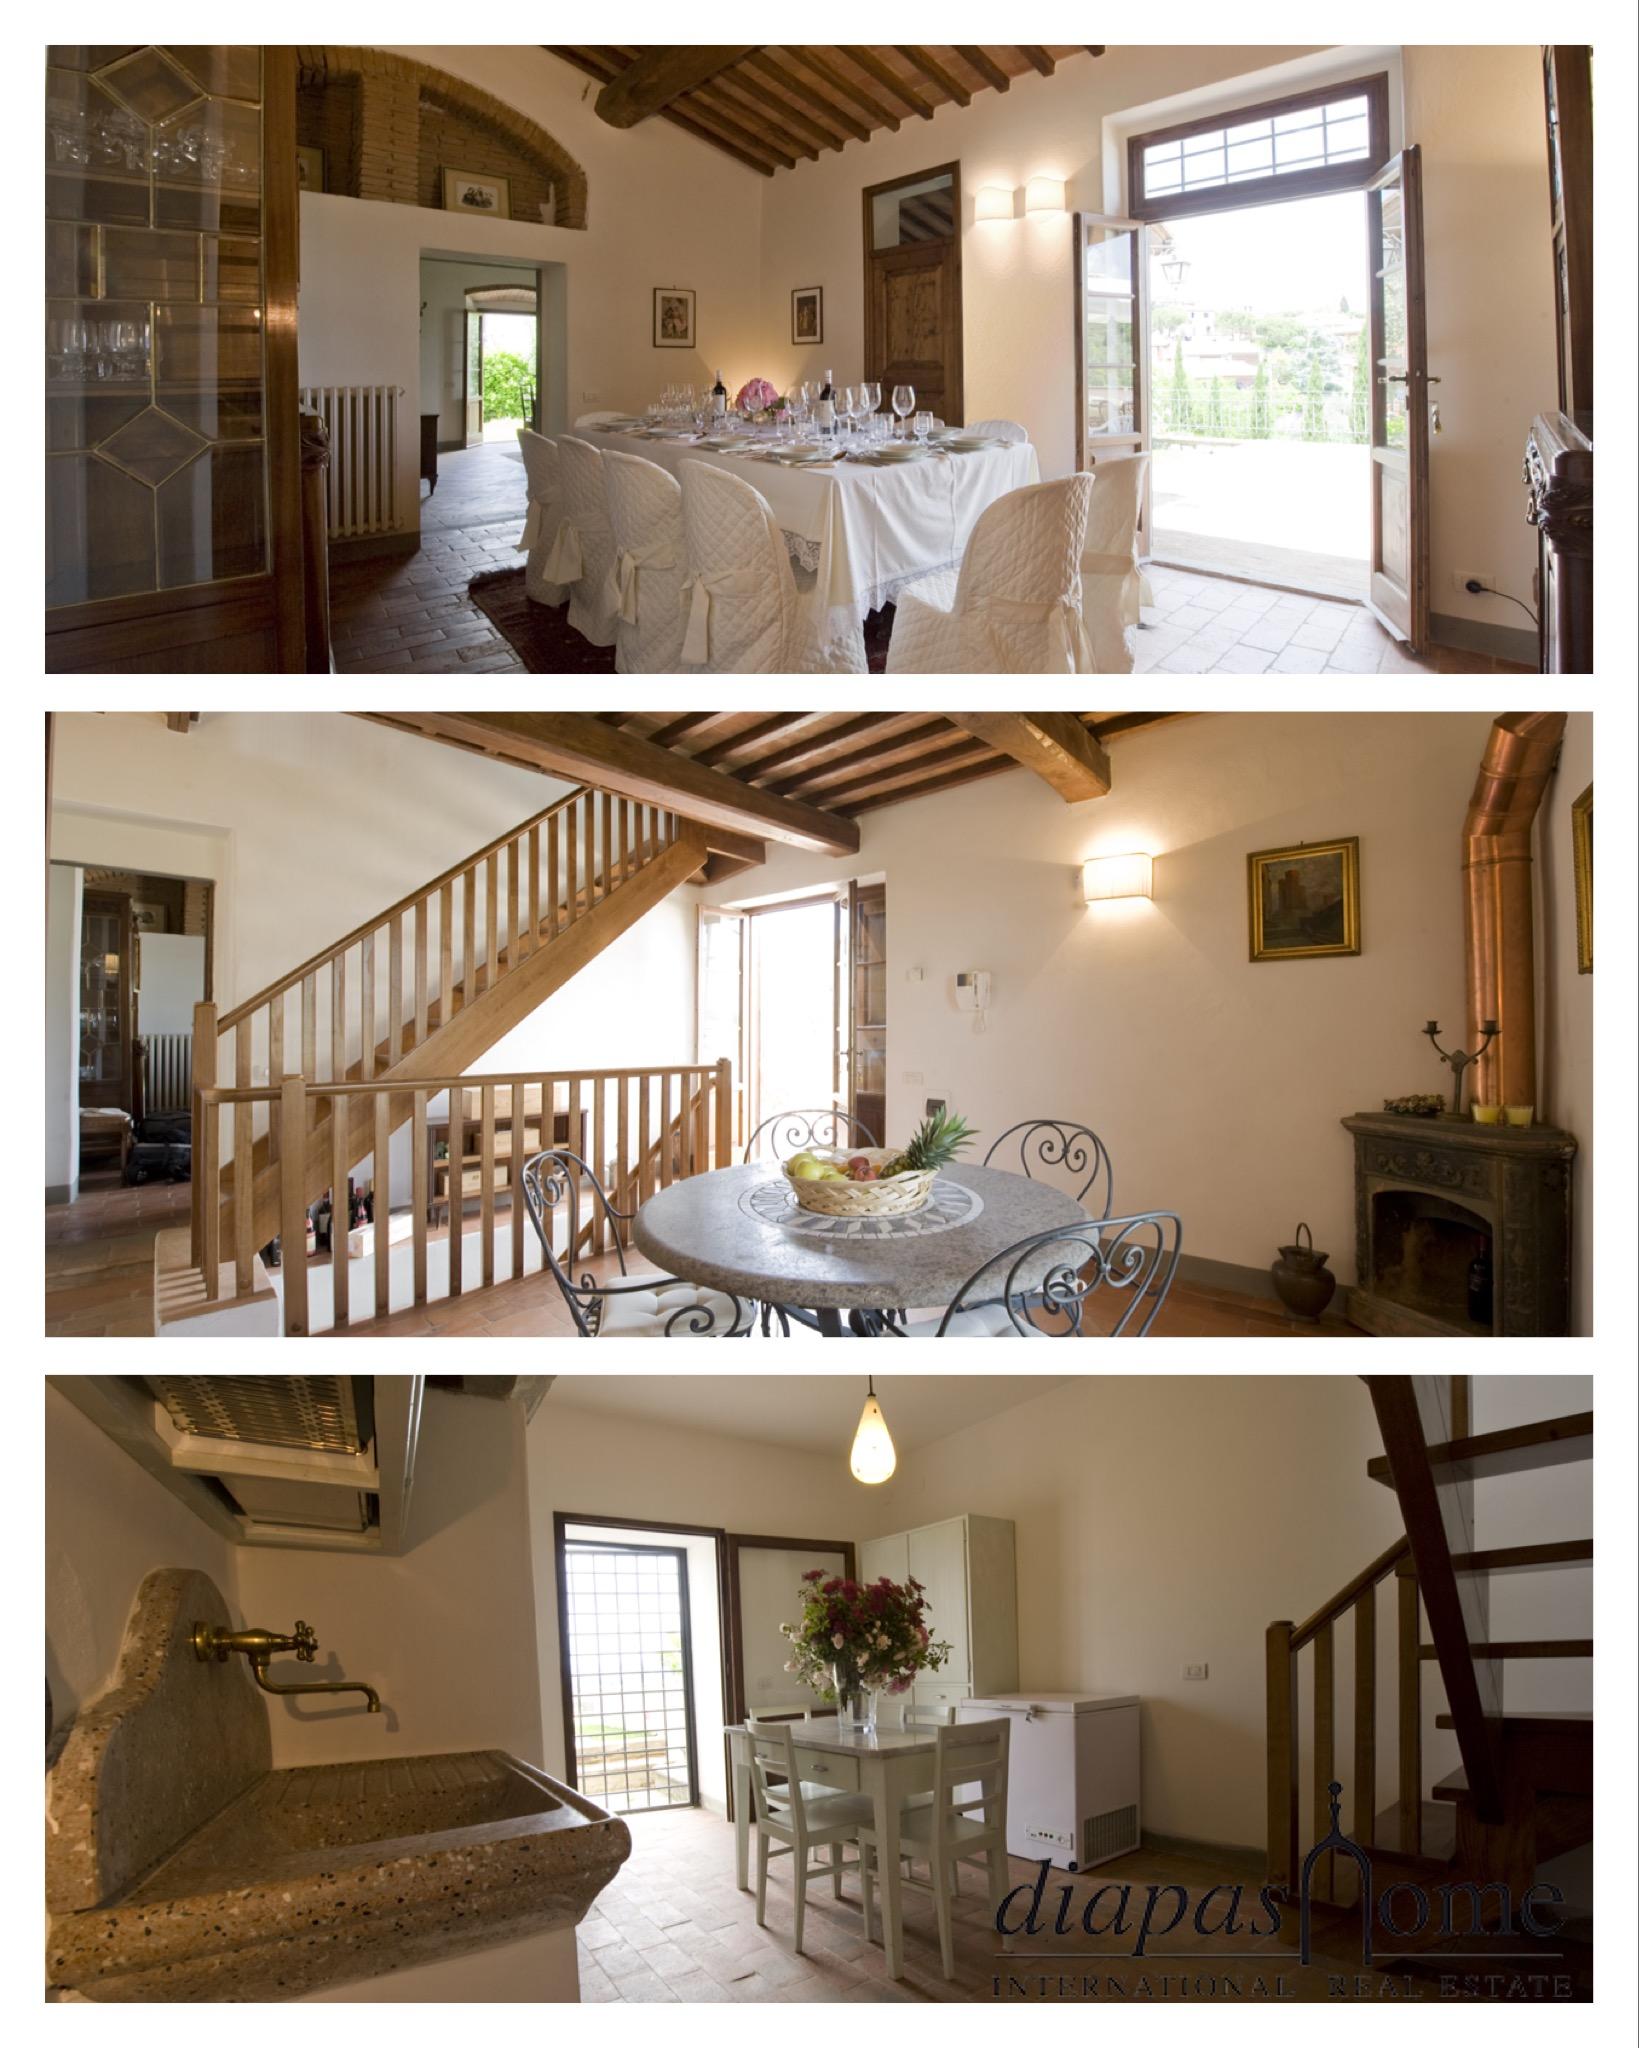 villa, carmignano,diapashome,real,estate_16